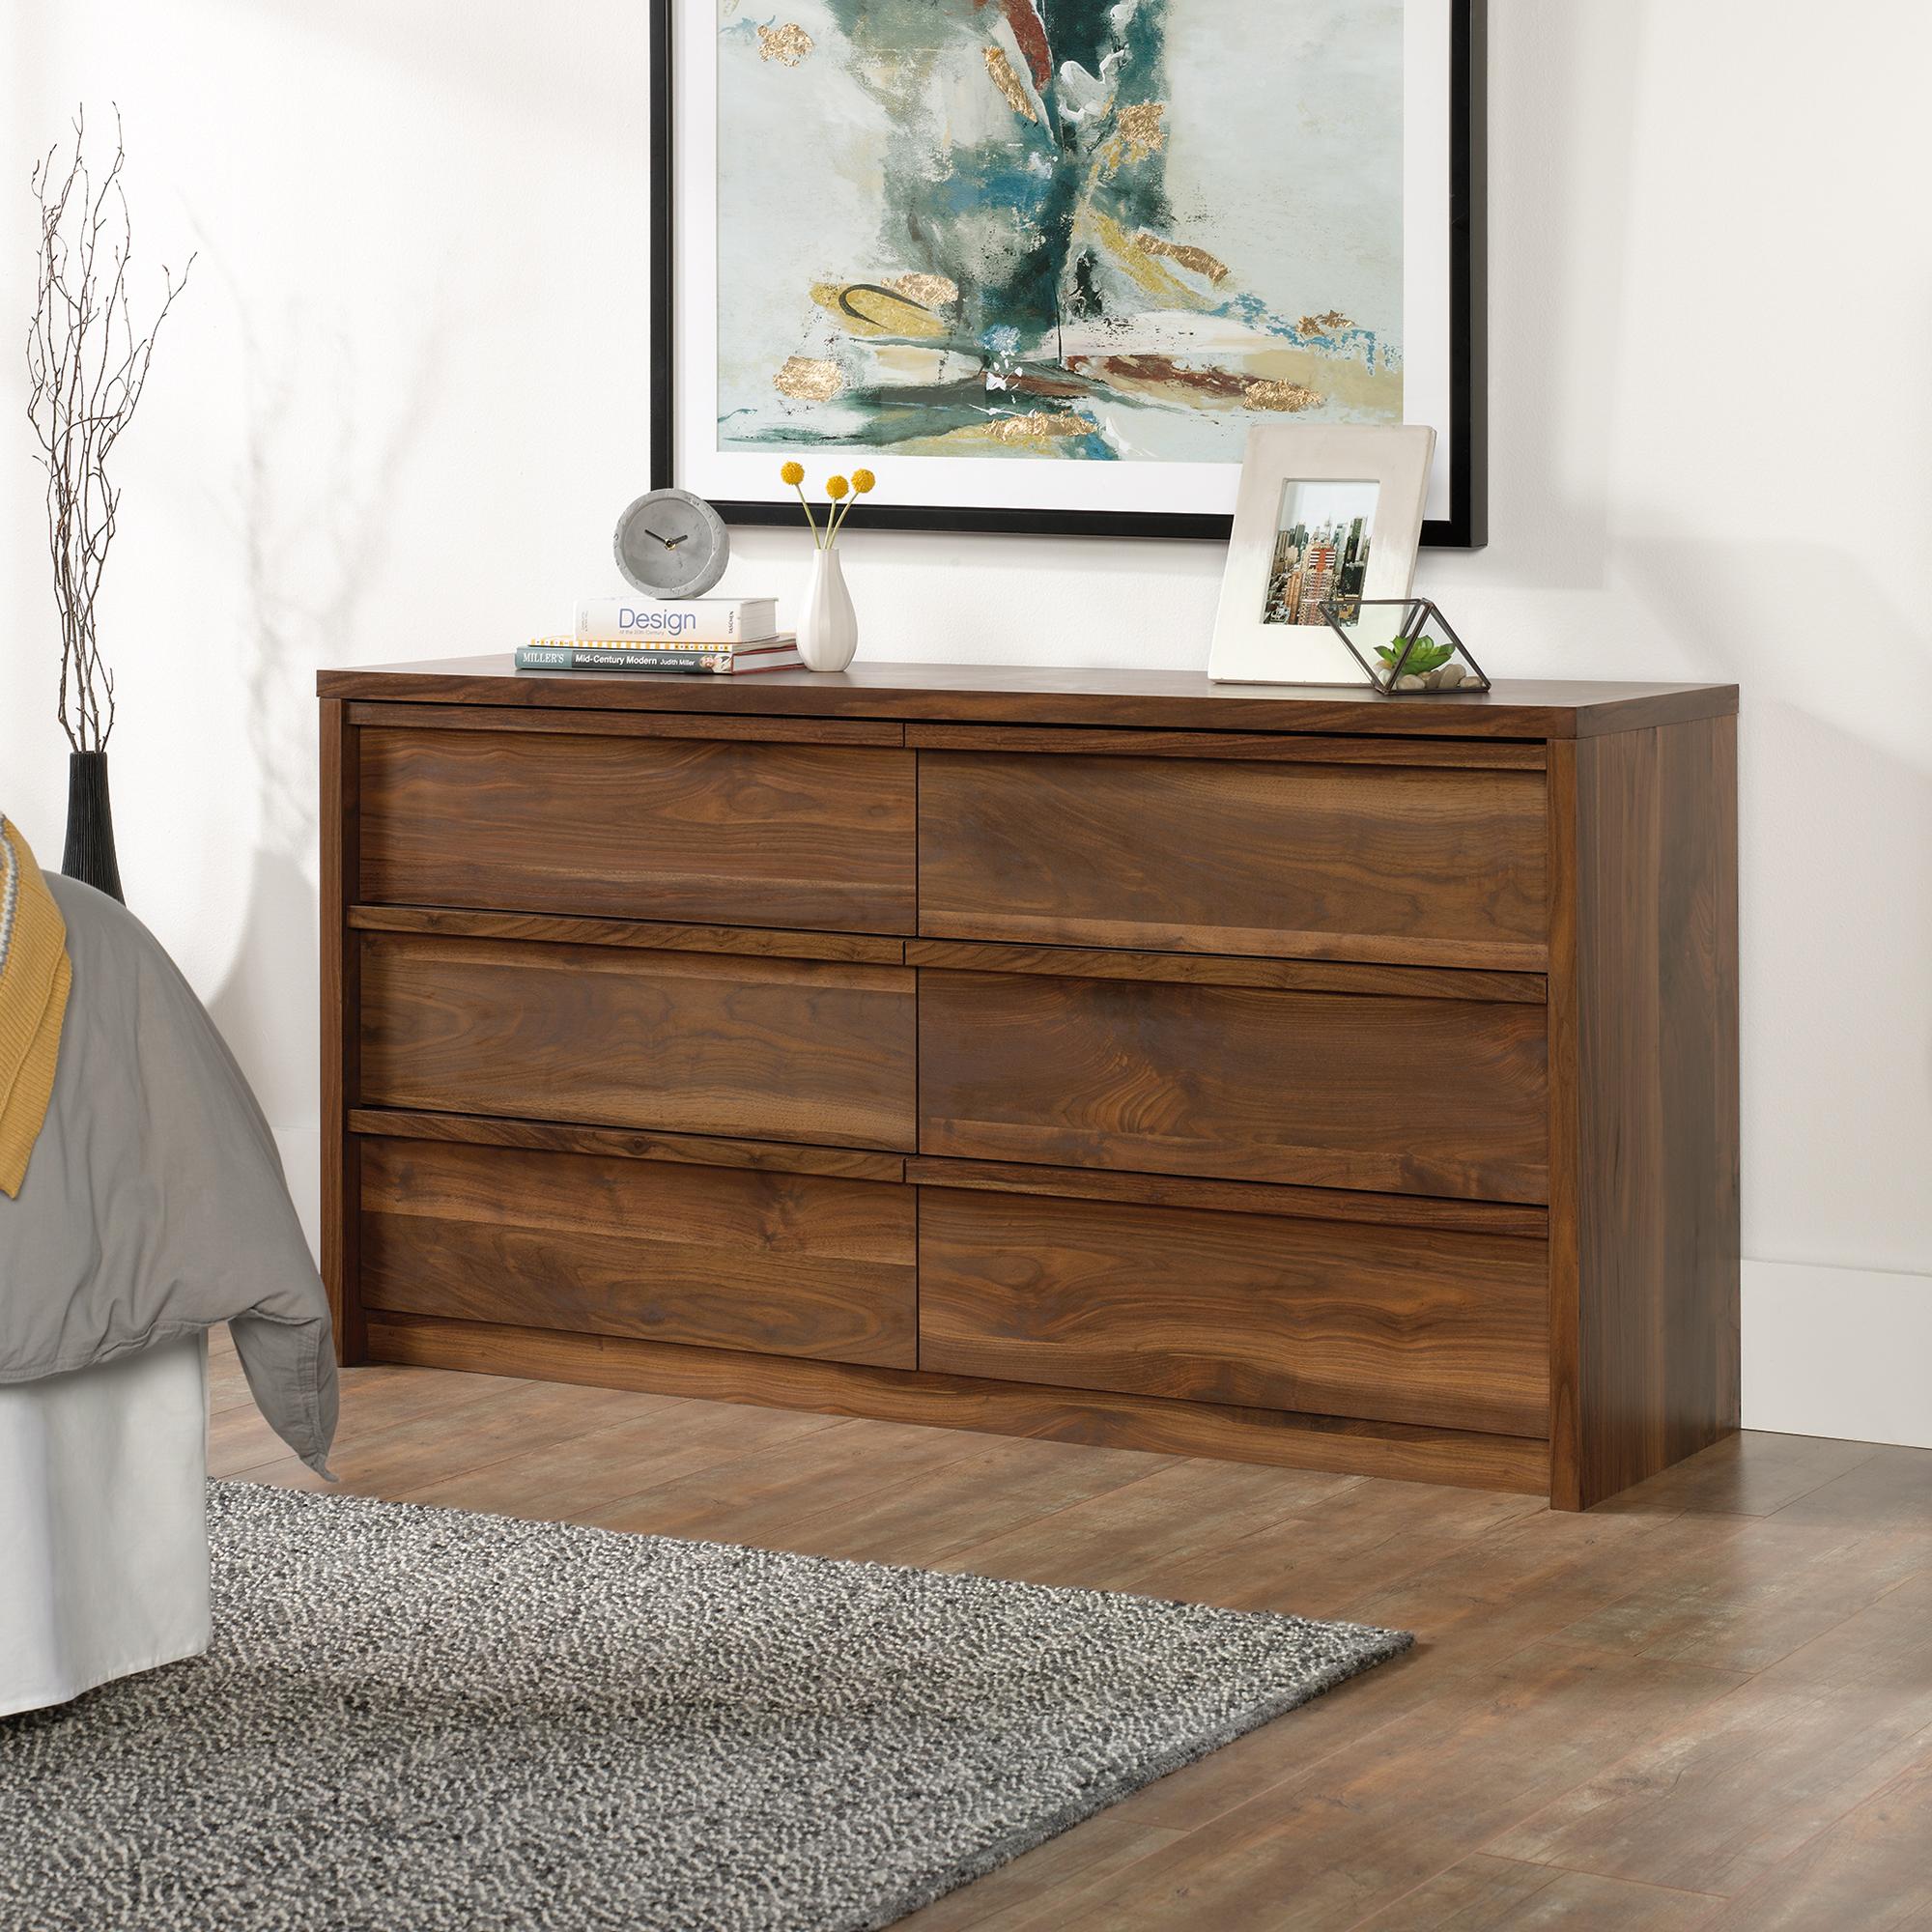 Sauder Harvey Park Dresser, Grand Walnut Finish